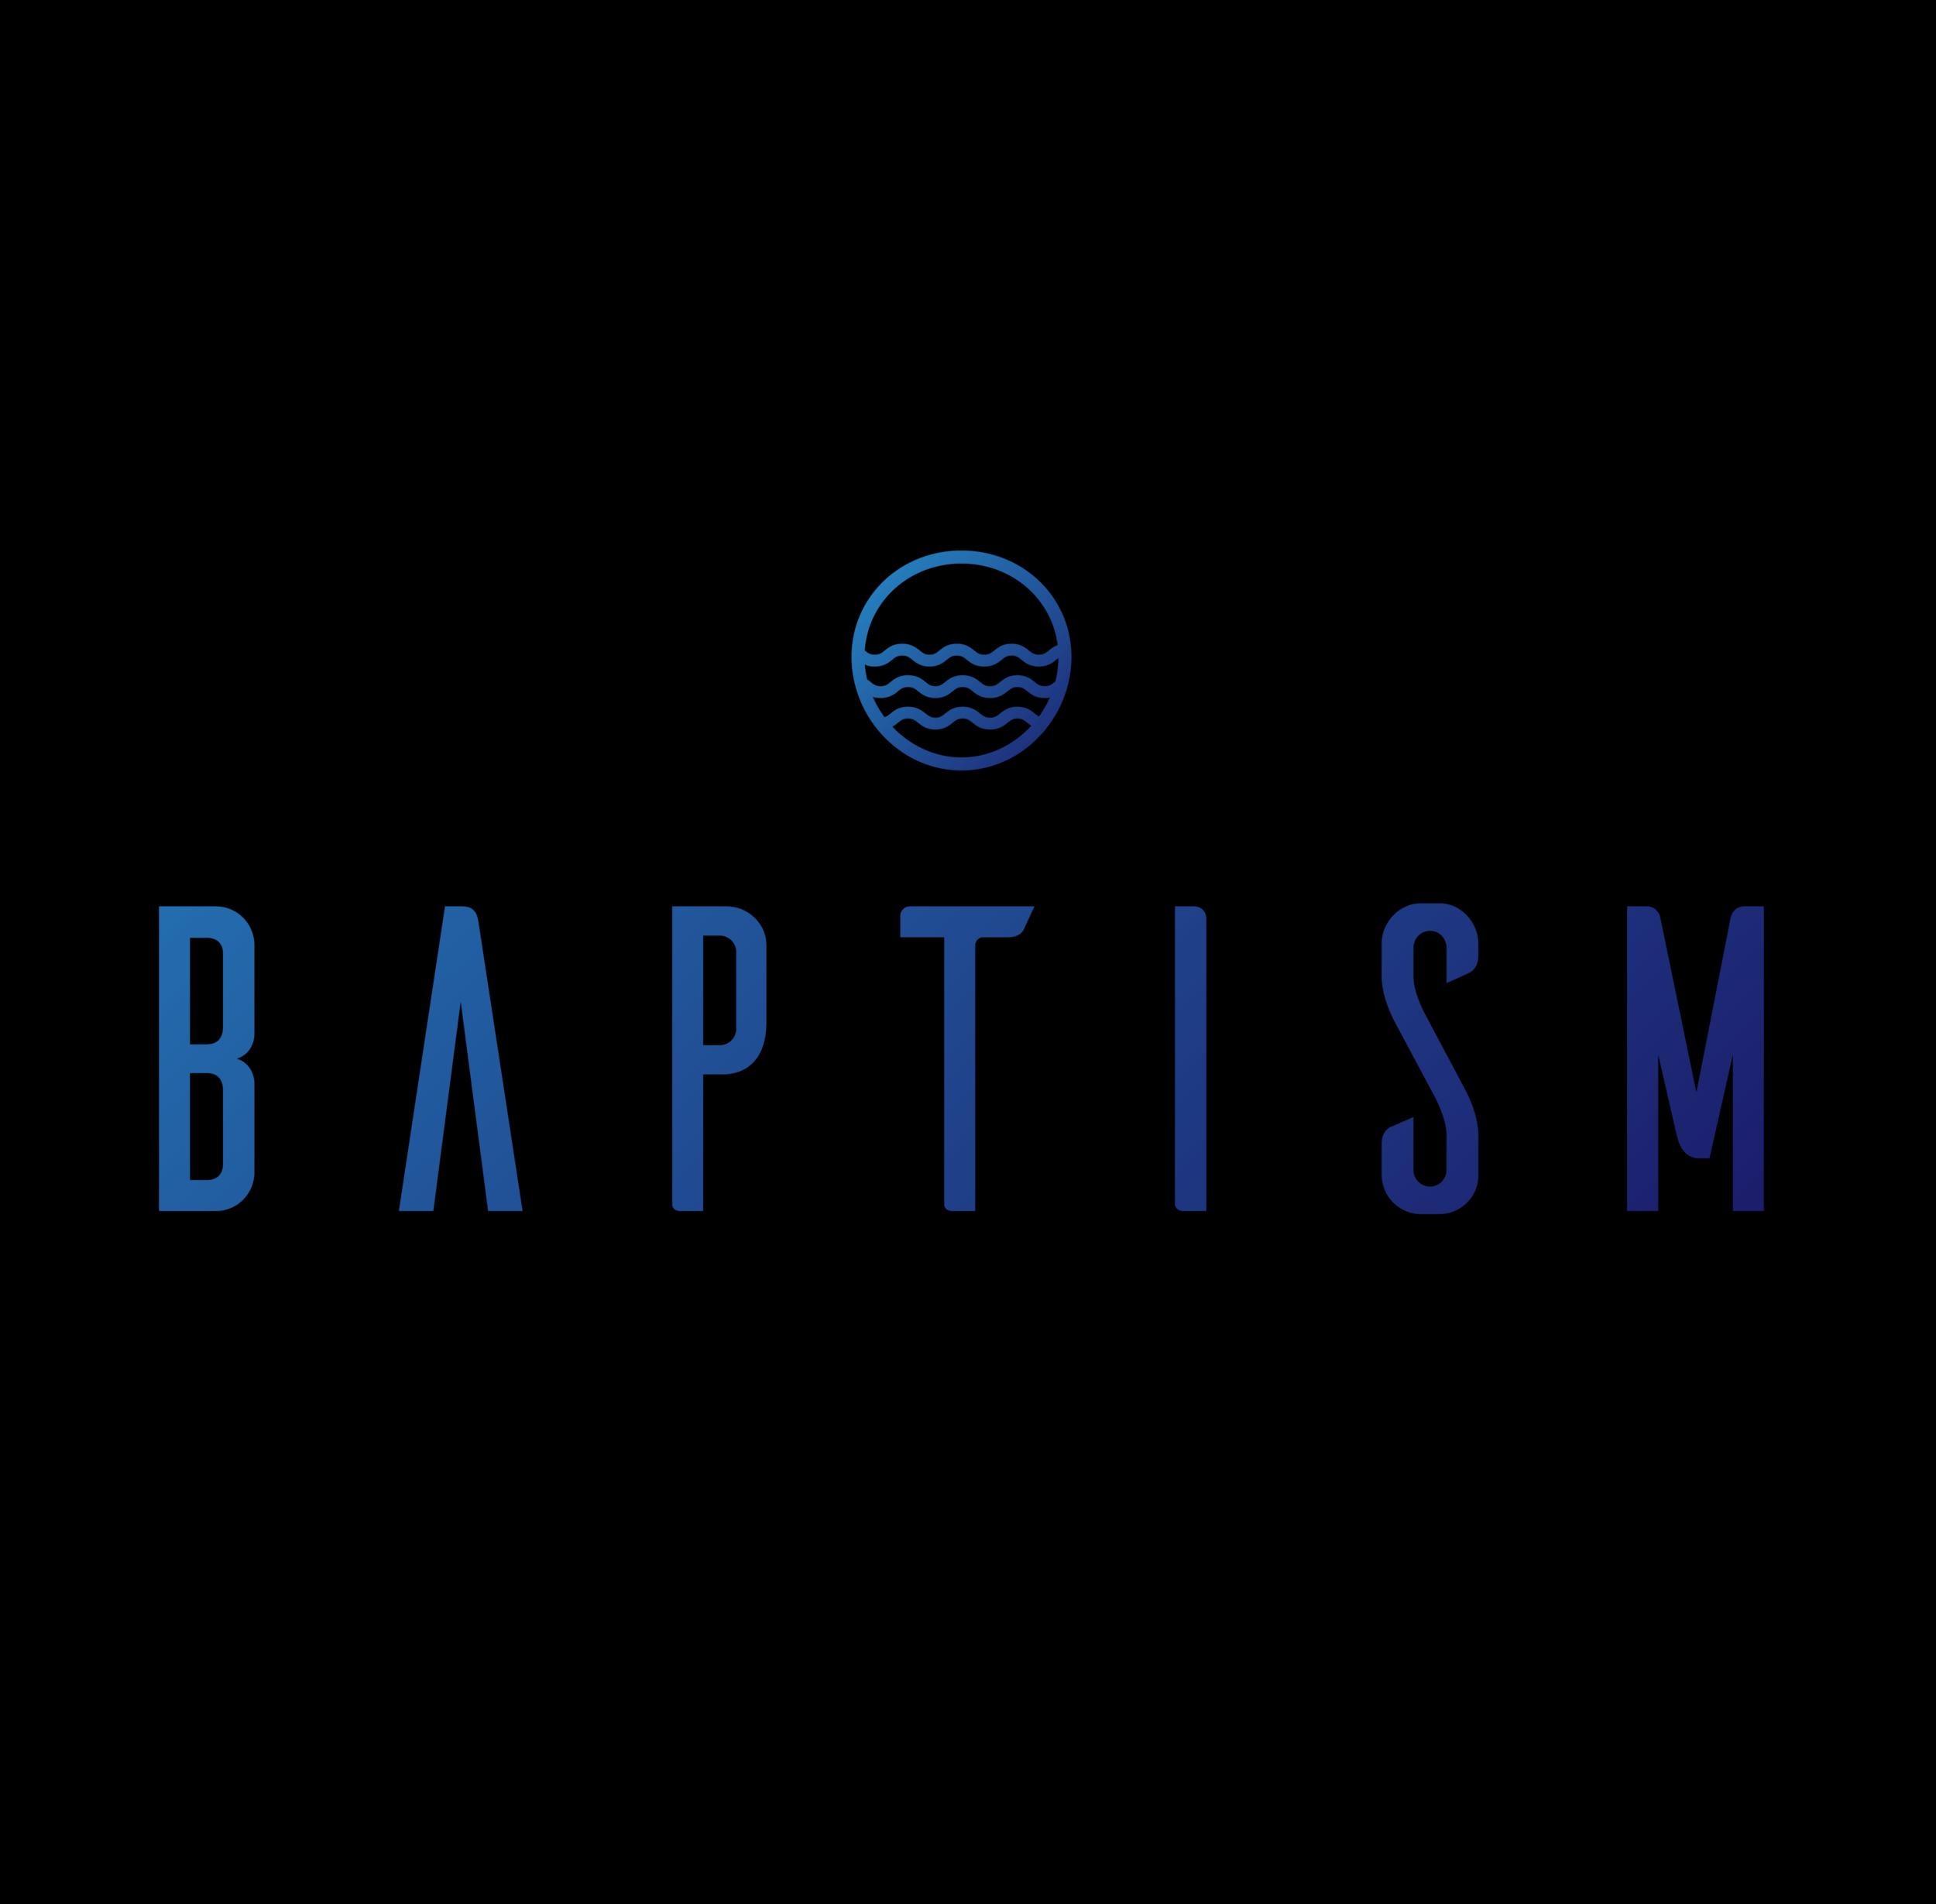 baptism-01.png